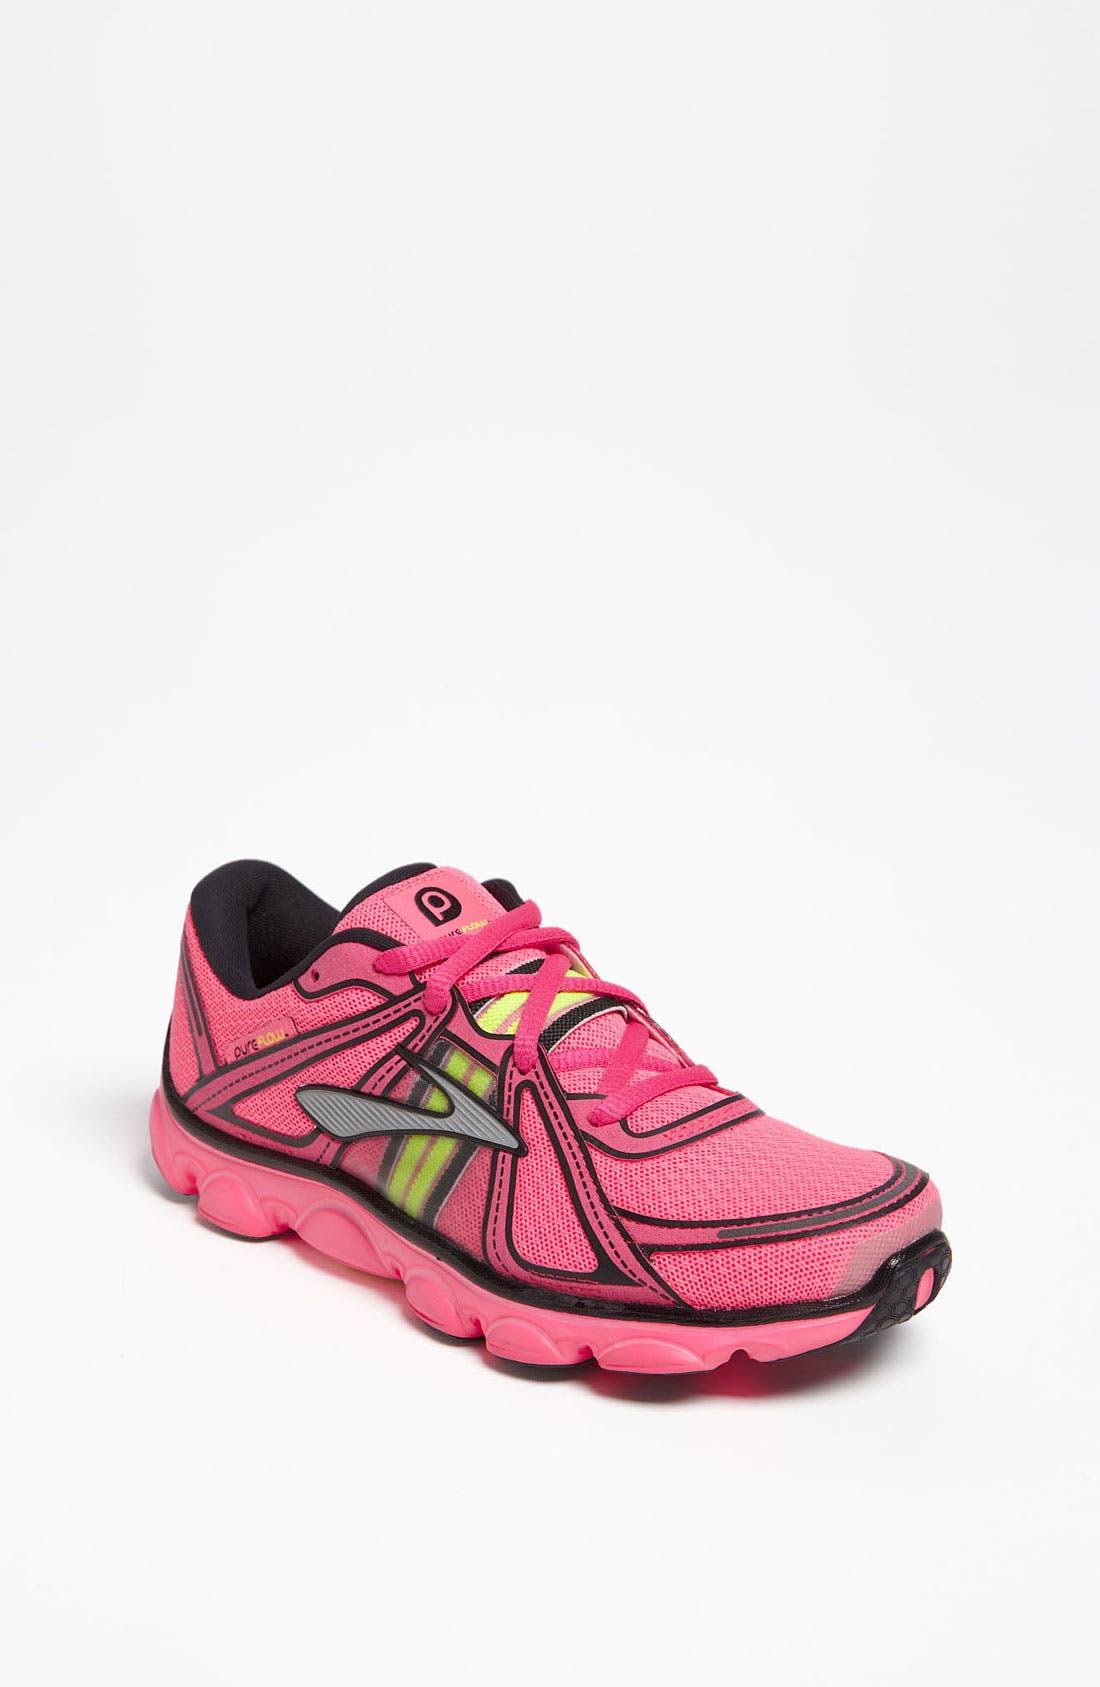 Main Image - Brooks 'Pureflow' Athletic Shoe (Toddler, Little Kid & Big Kid)